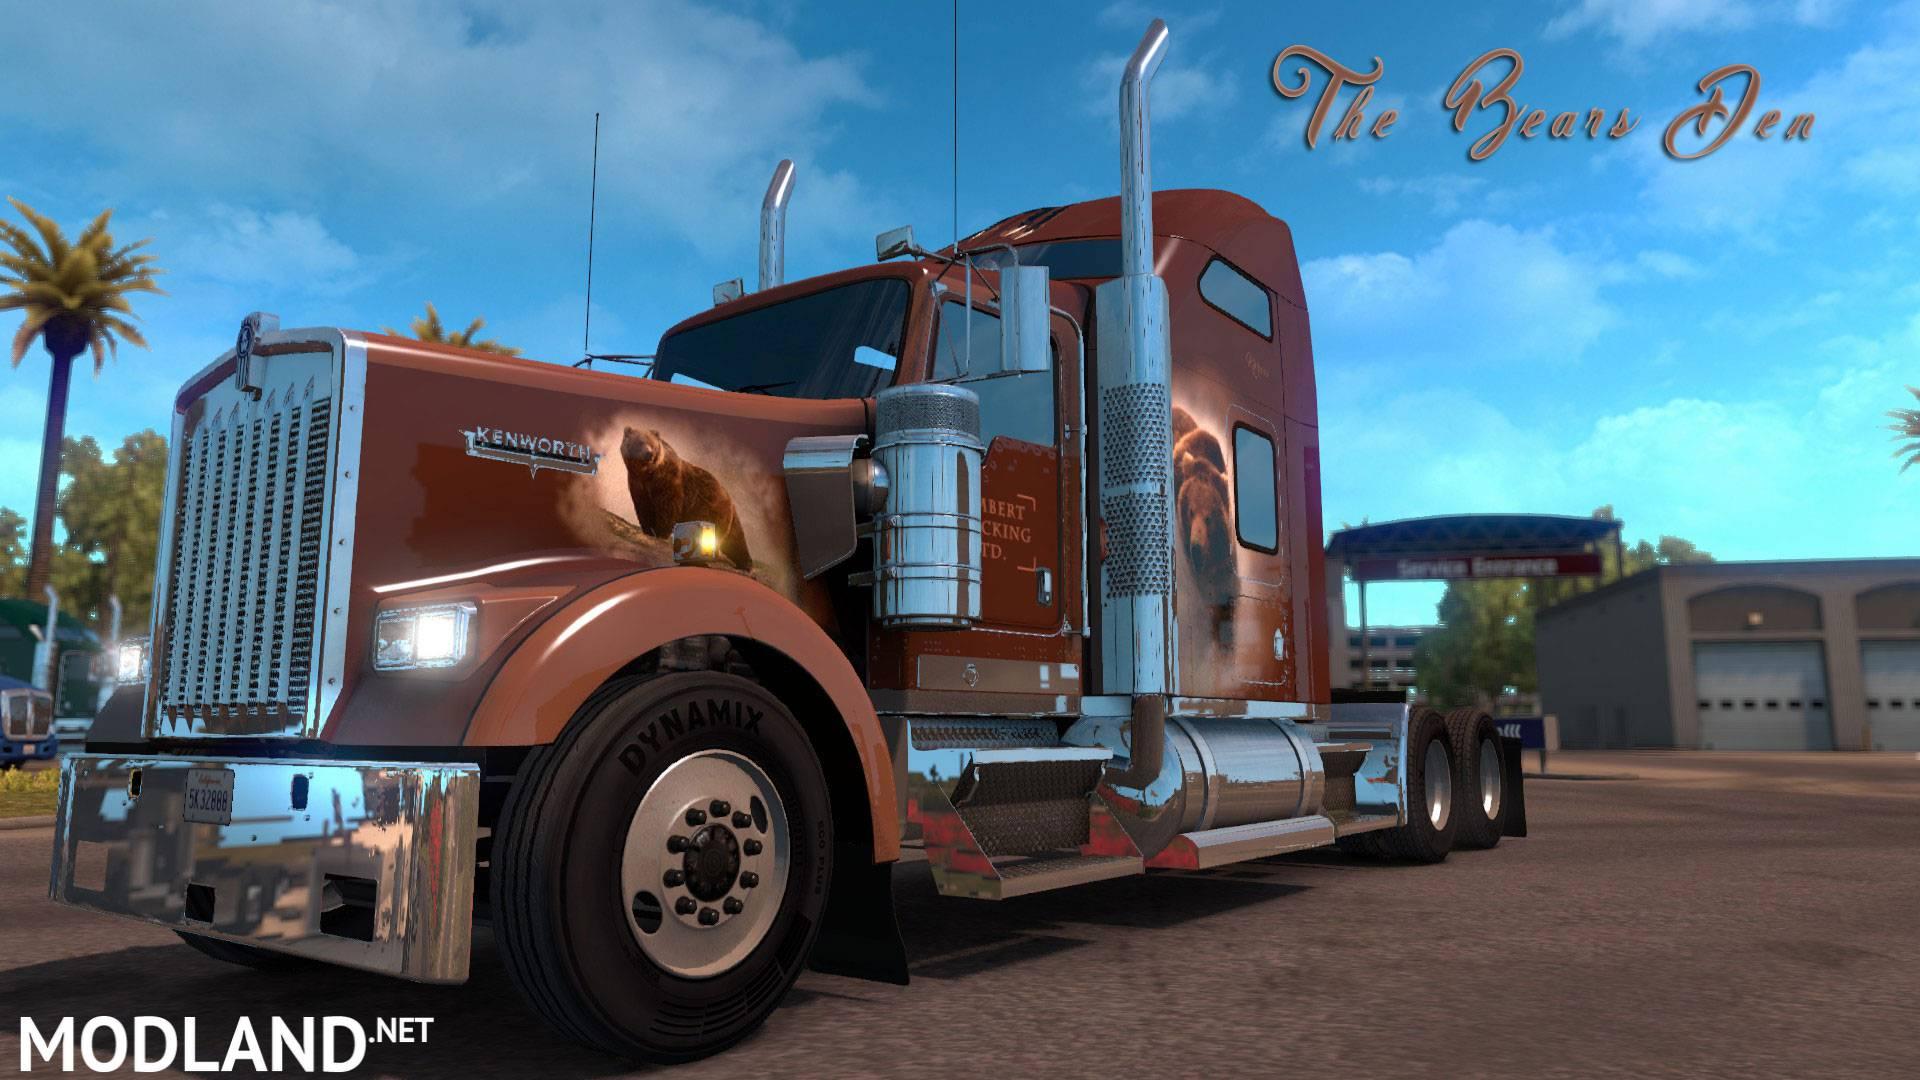 The Bears Den Khross Custom Skin - Kenworth W900 mod for American Truck Simulator, ATS